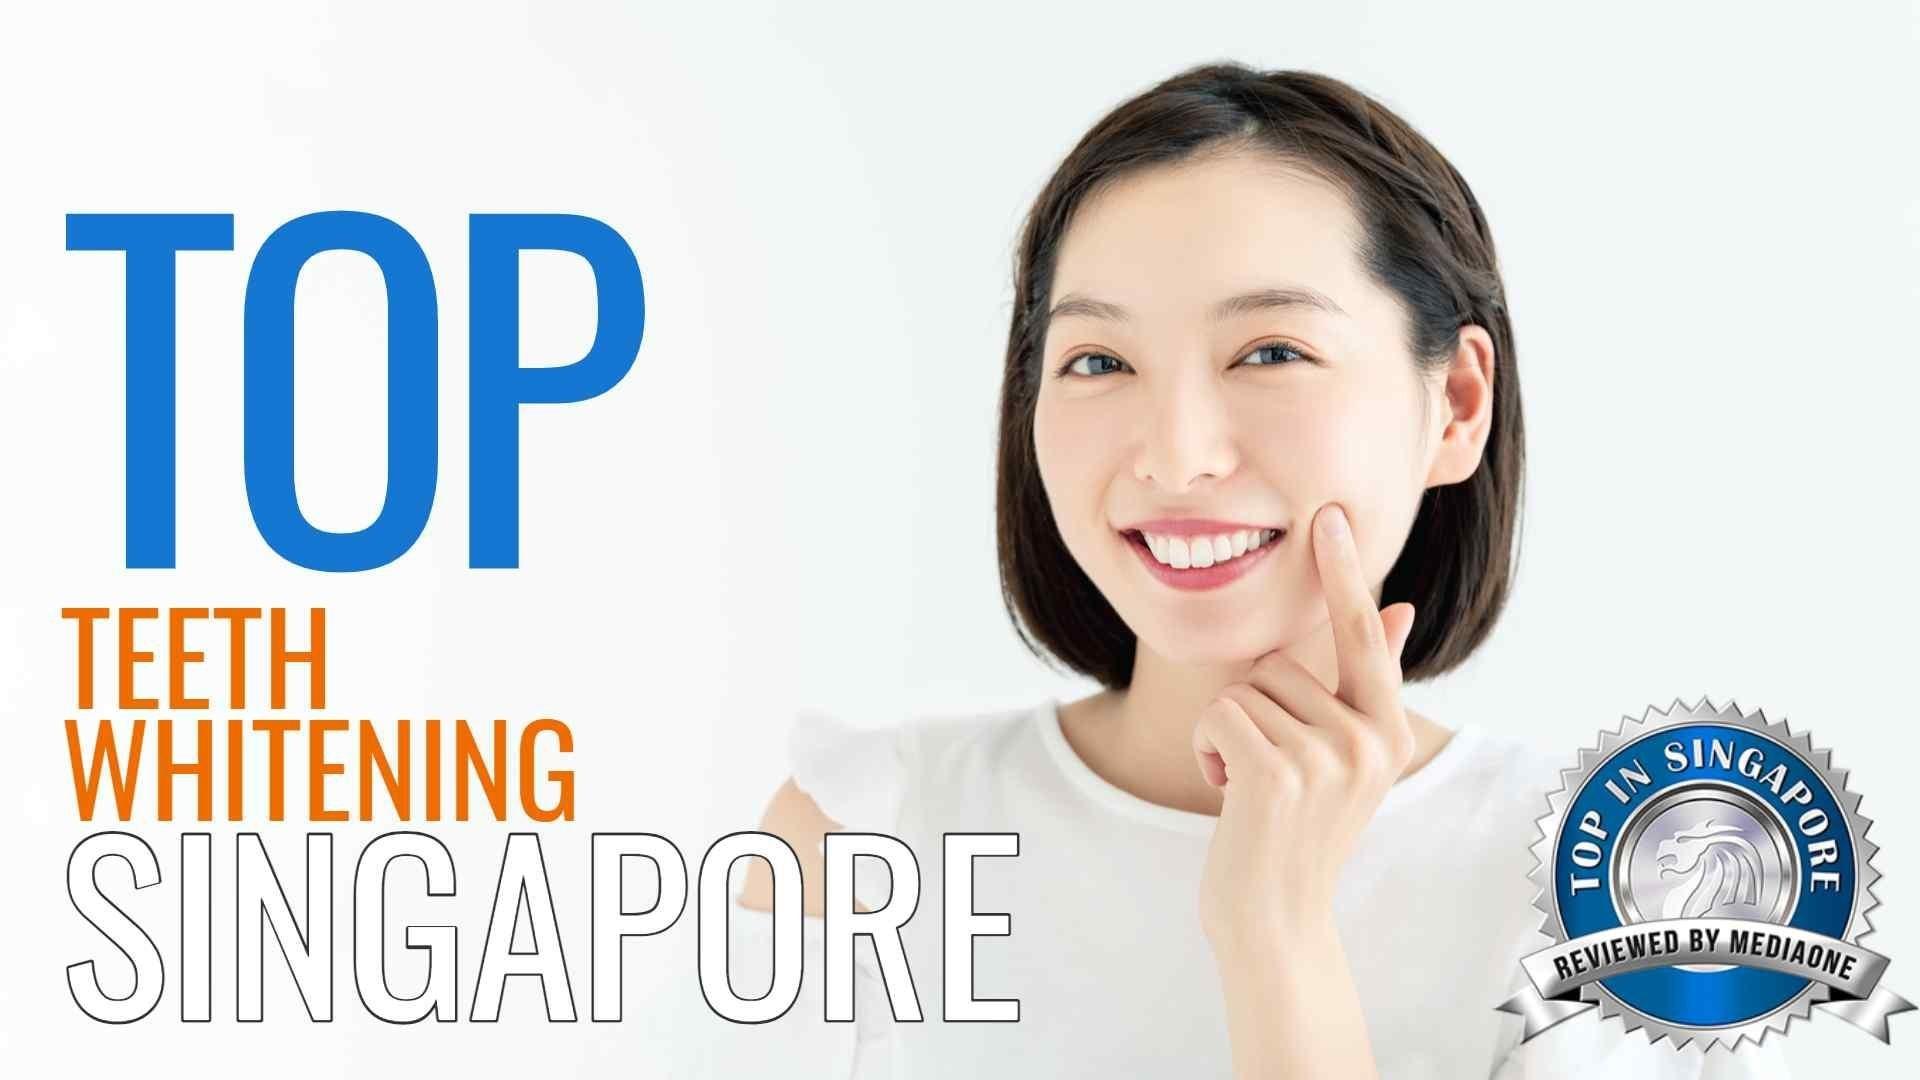 Top Teeth Whitening In Singapore